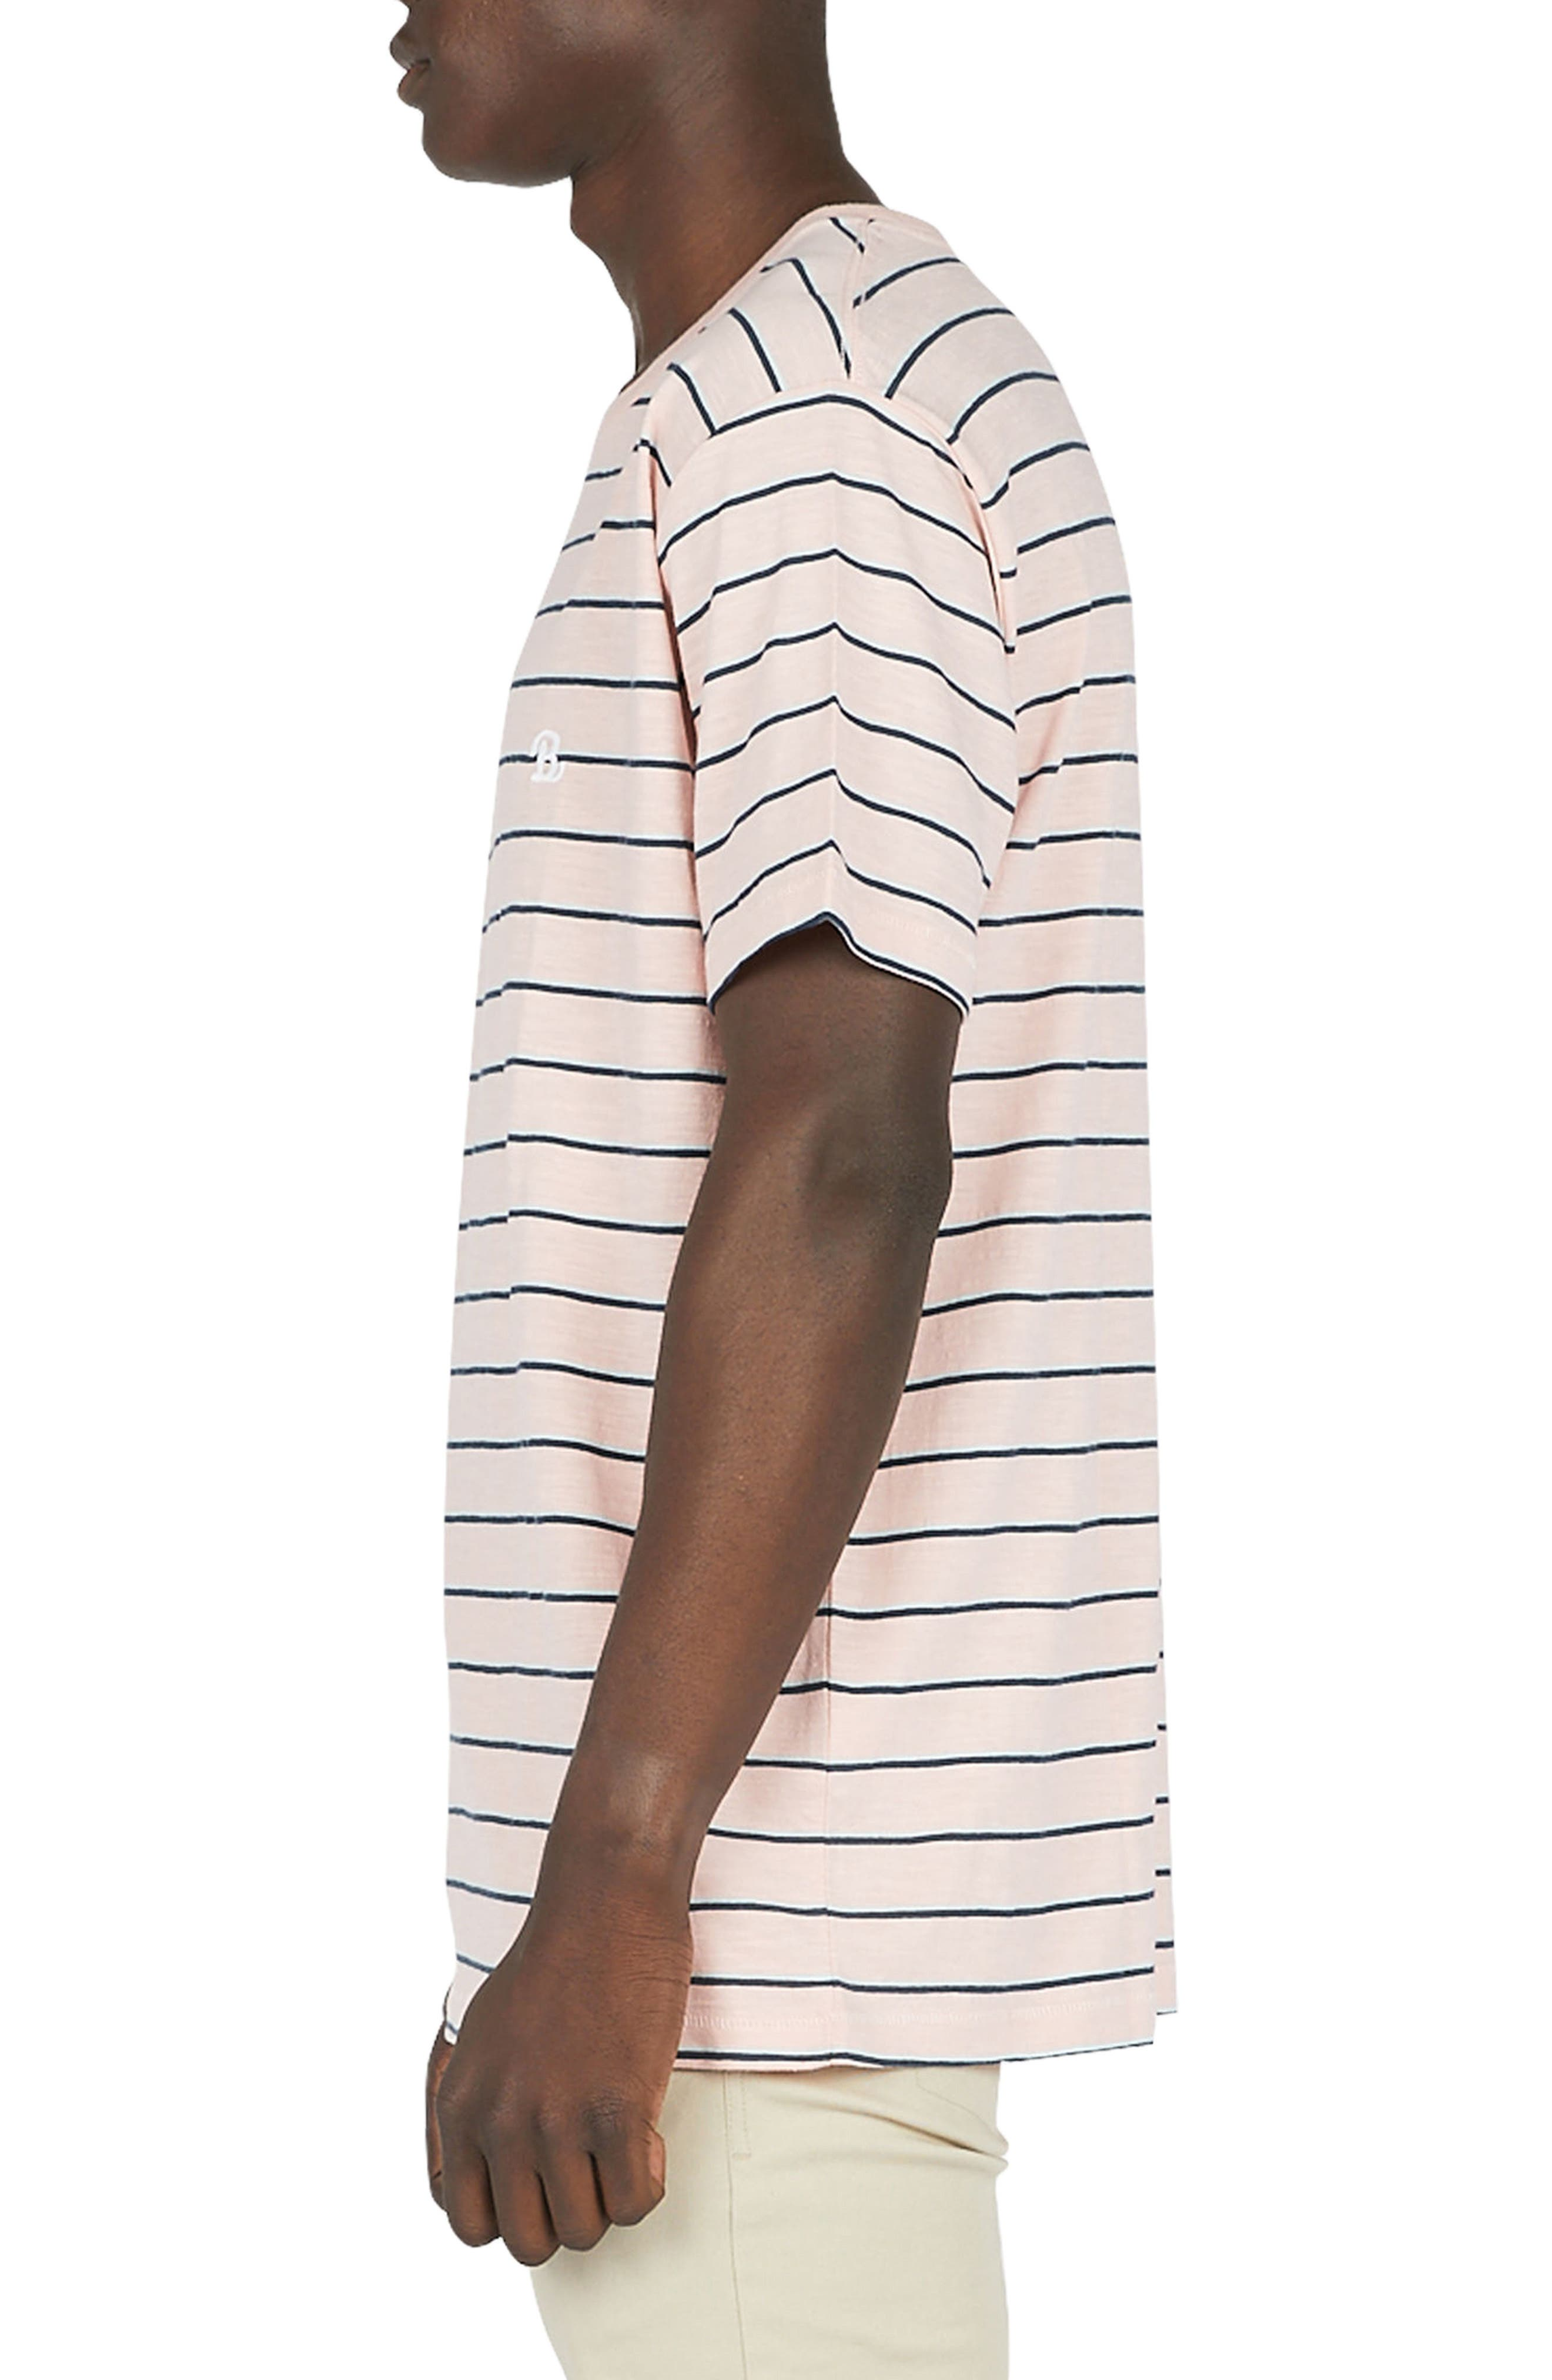 B.Schooled T-Shirt,                             Alternate thumbnail 3, color,                             682